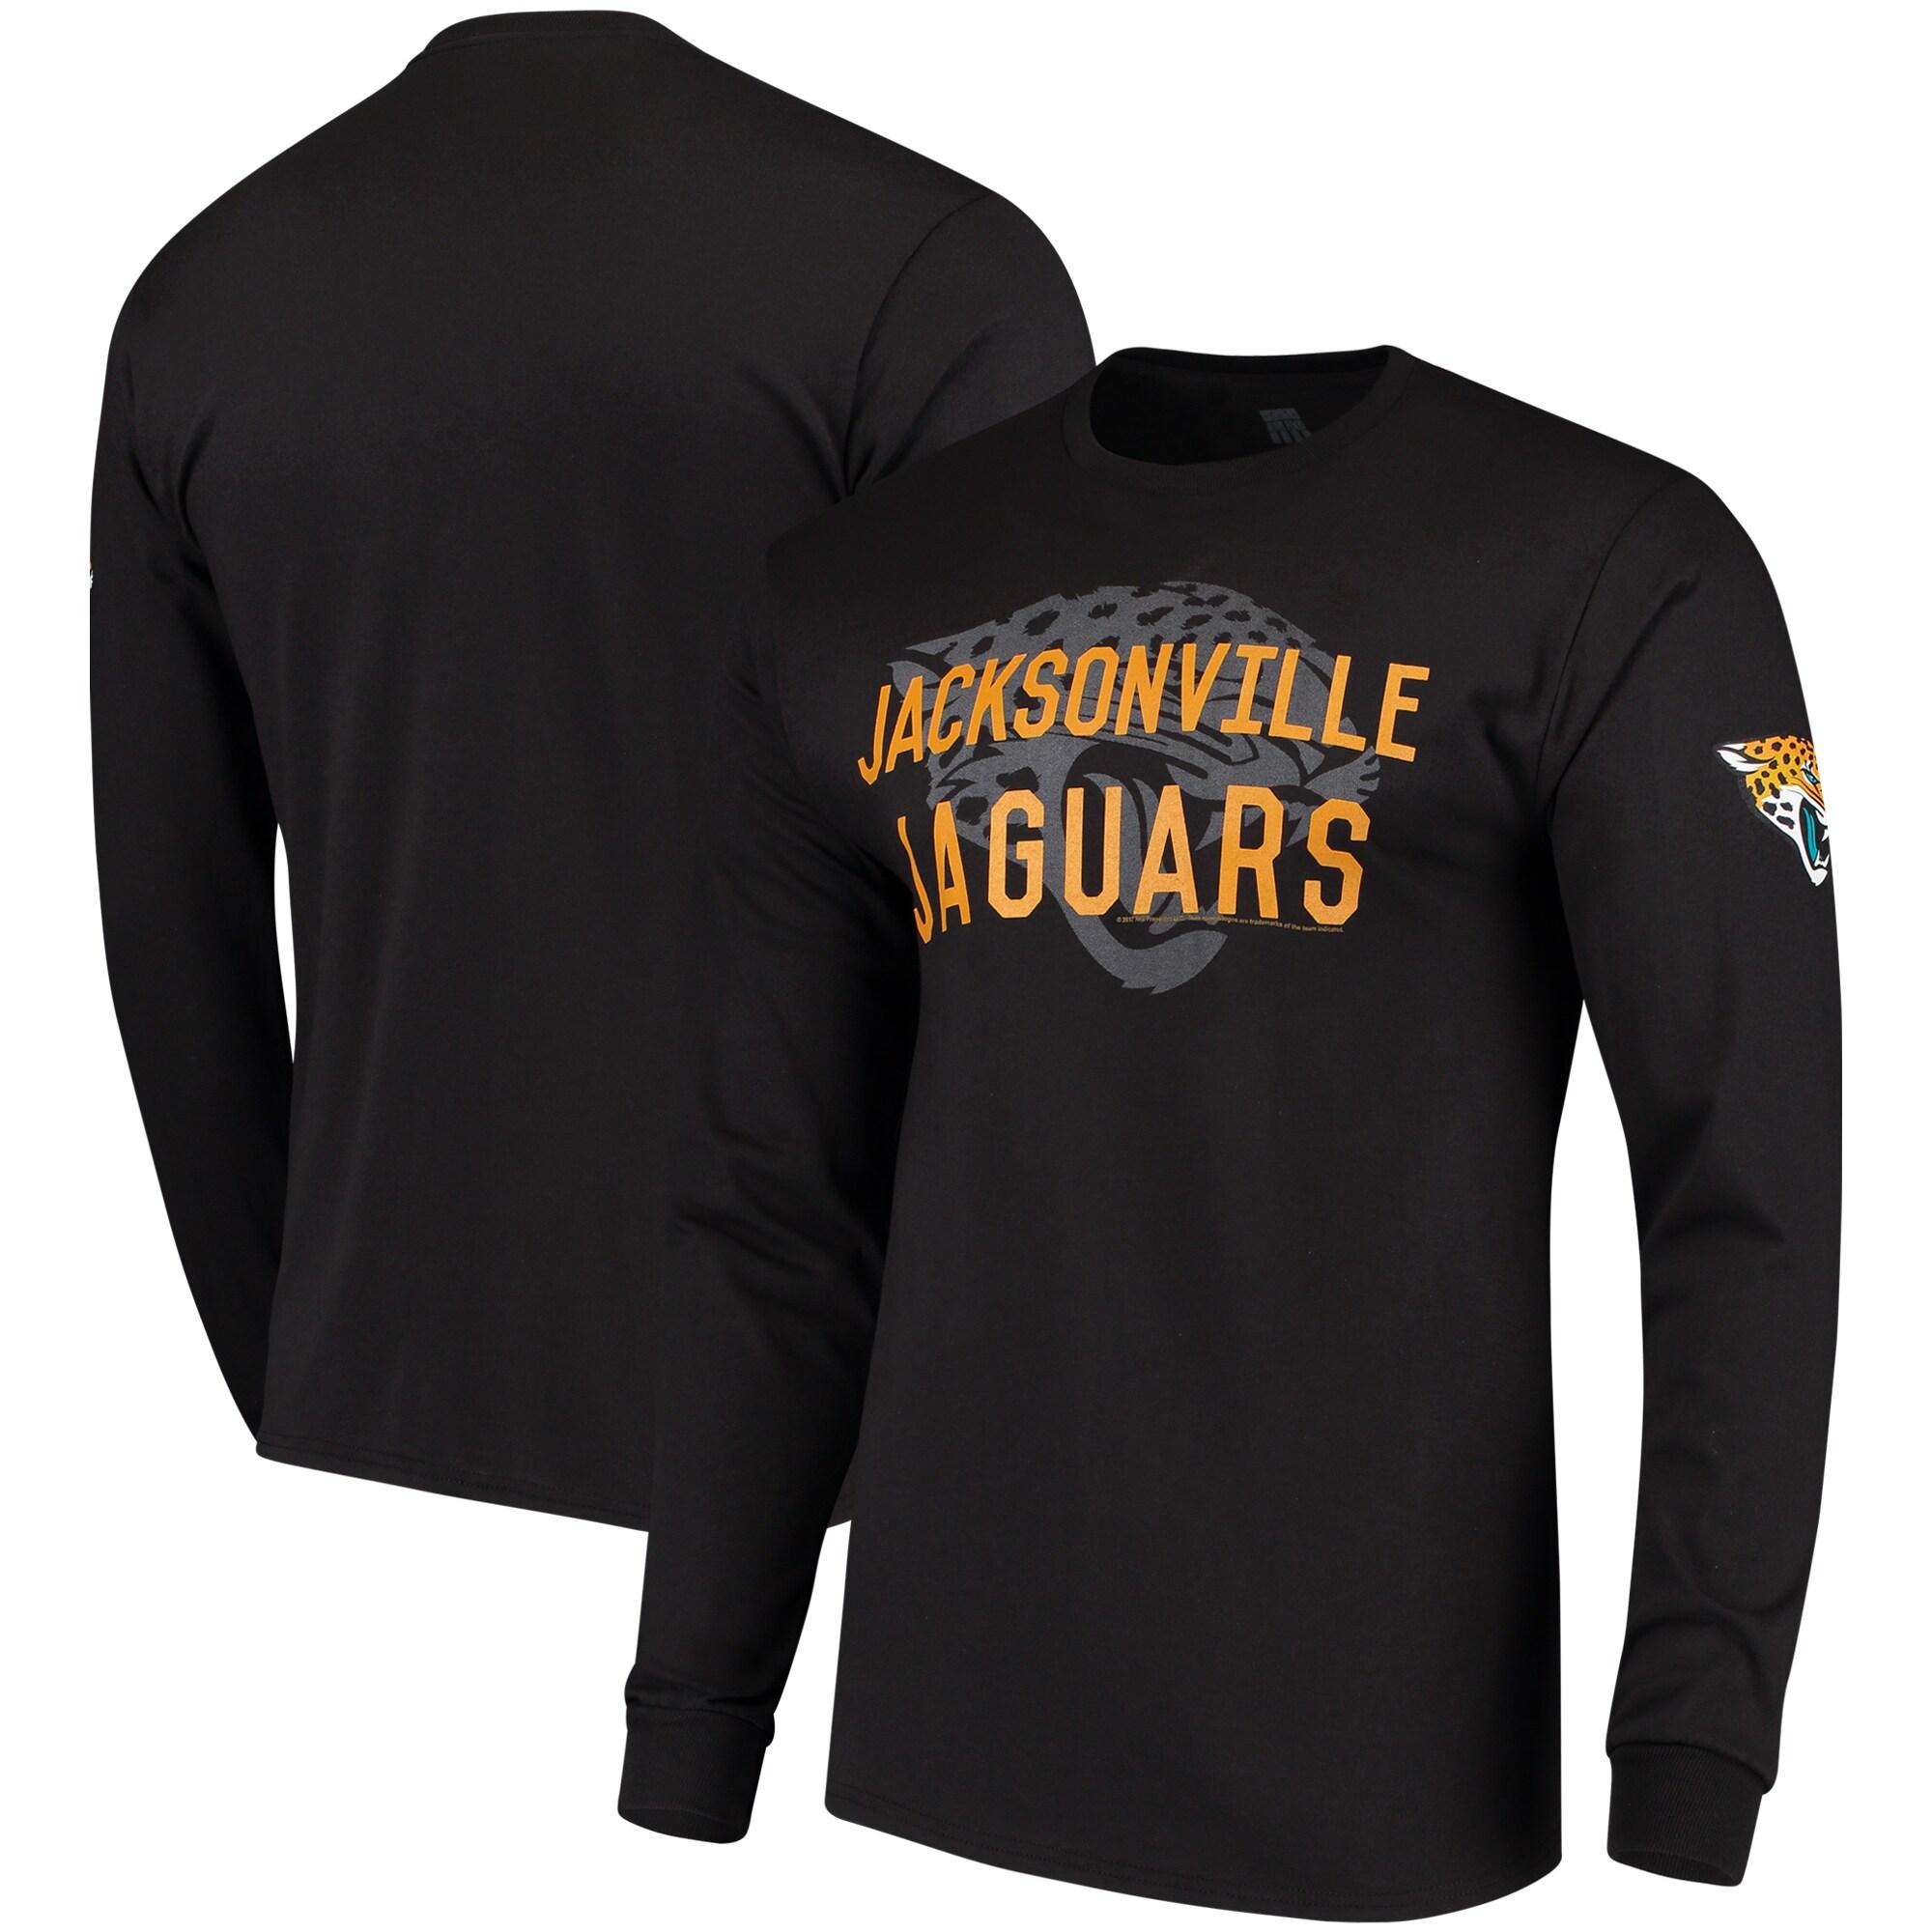 Jacksonville Jaguars Fade Route Long Sleeve T-Shirt - Black